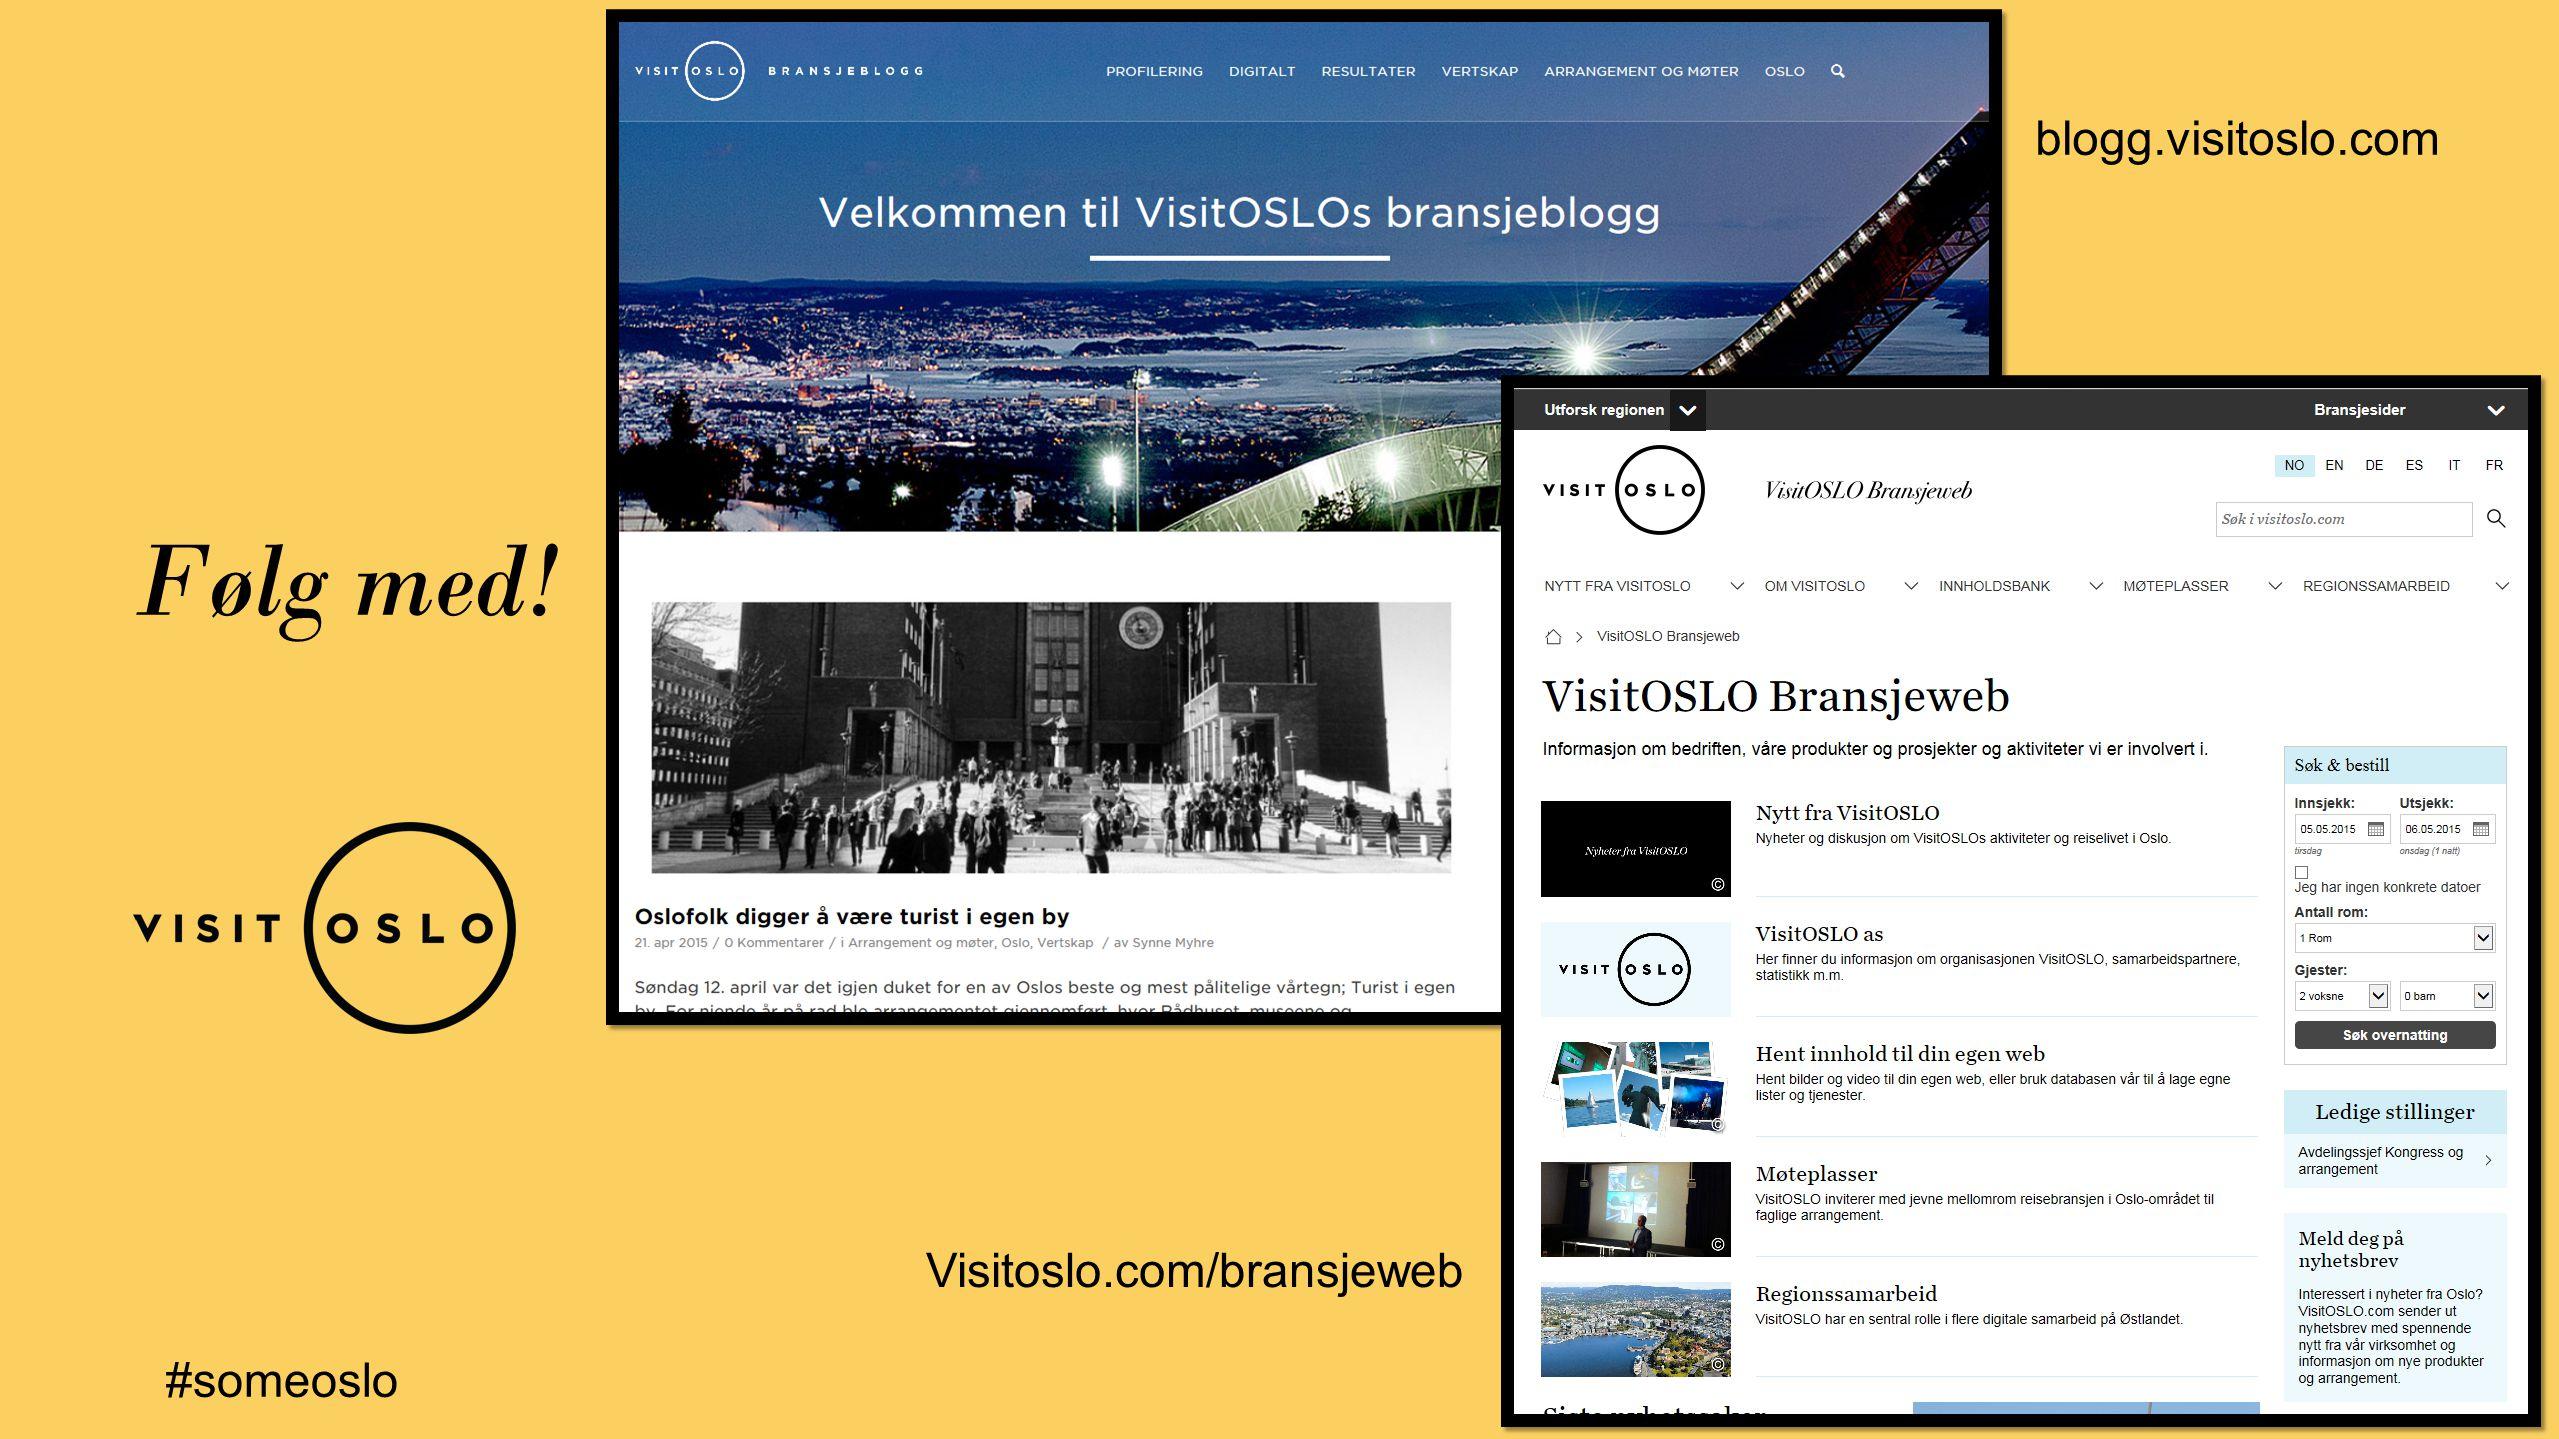 Følg med! blogg.visitoslo.com Visitoslo.com/bransjeweb #someoslo